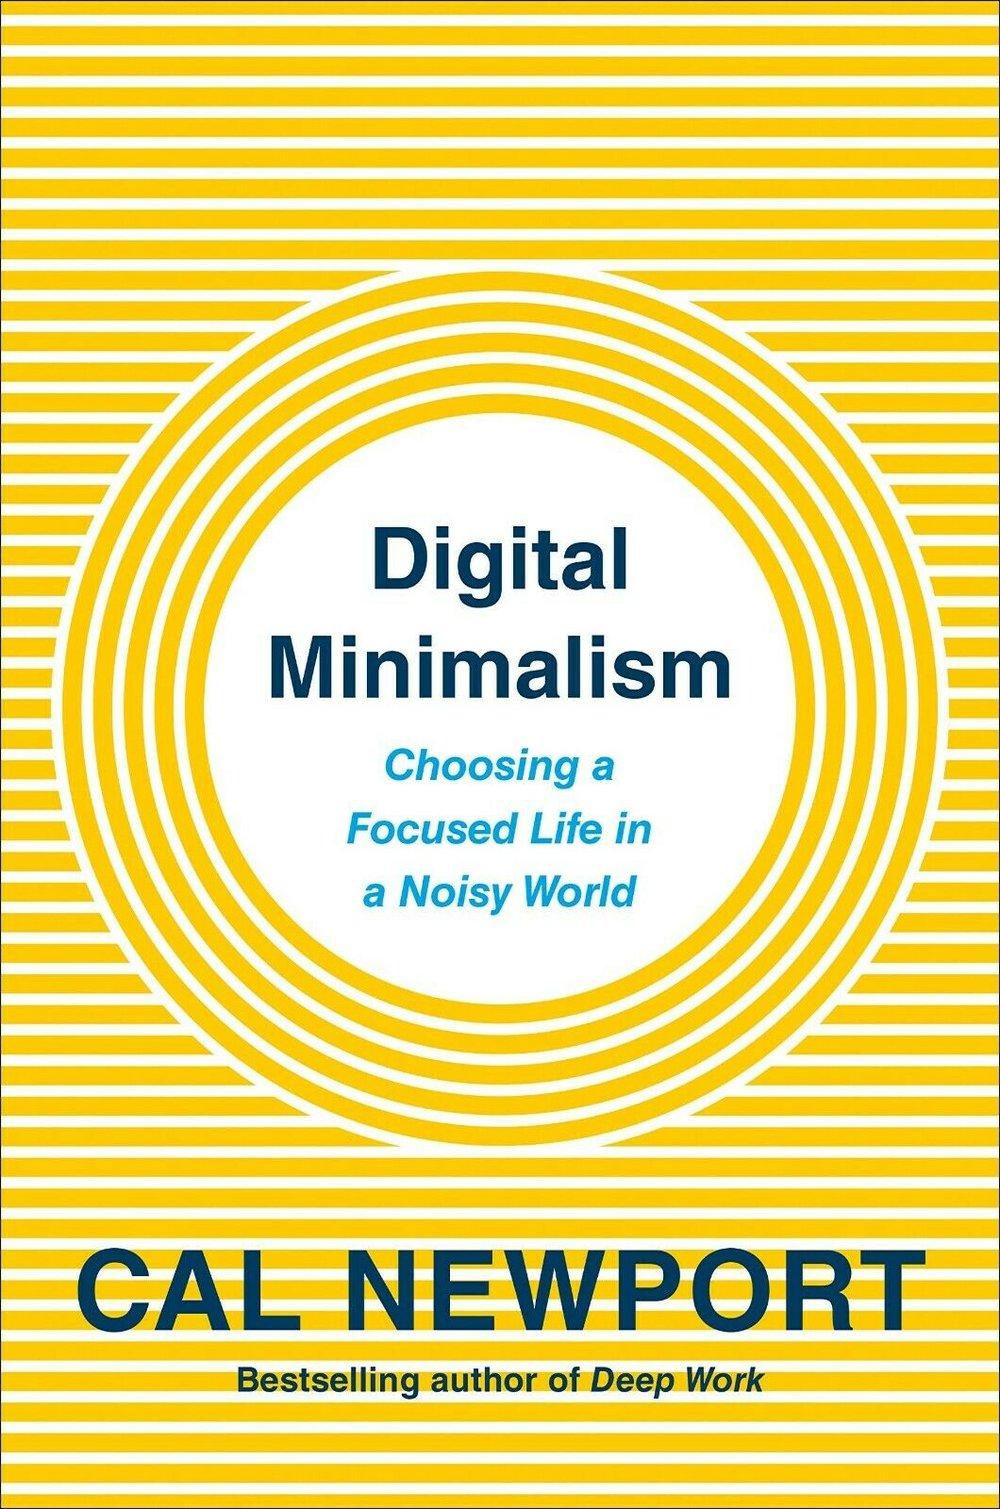 digital minimalism.jpg